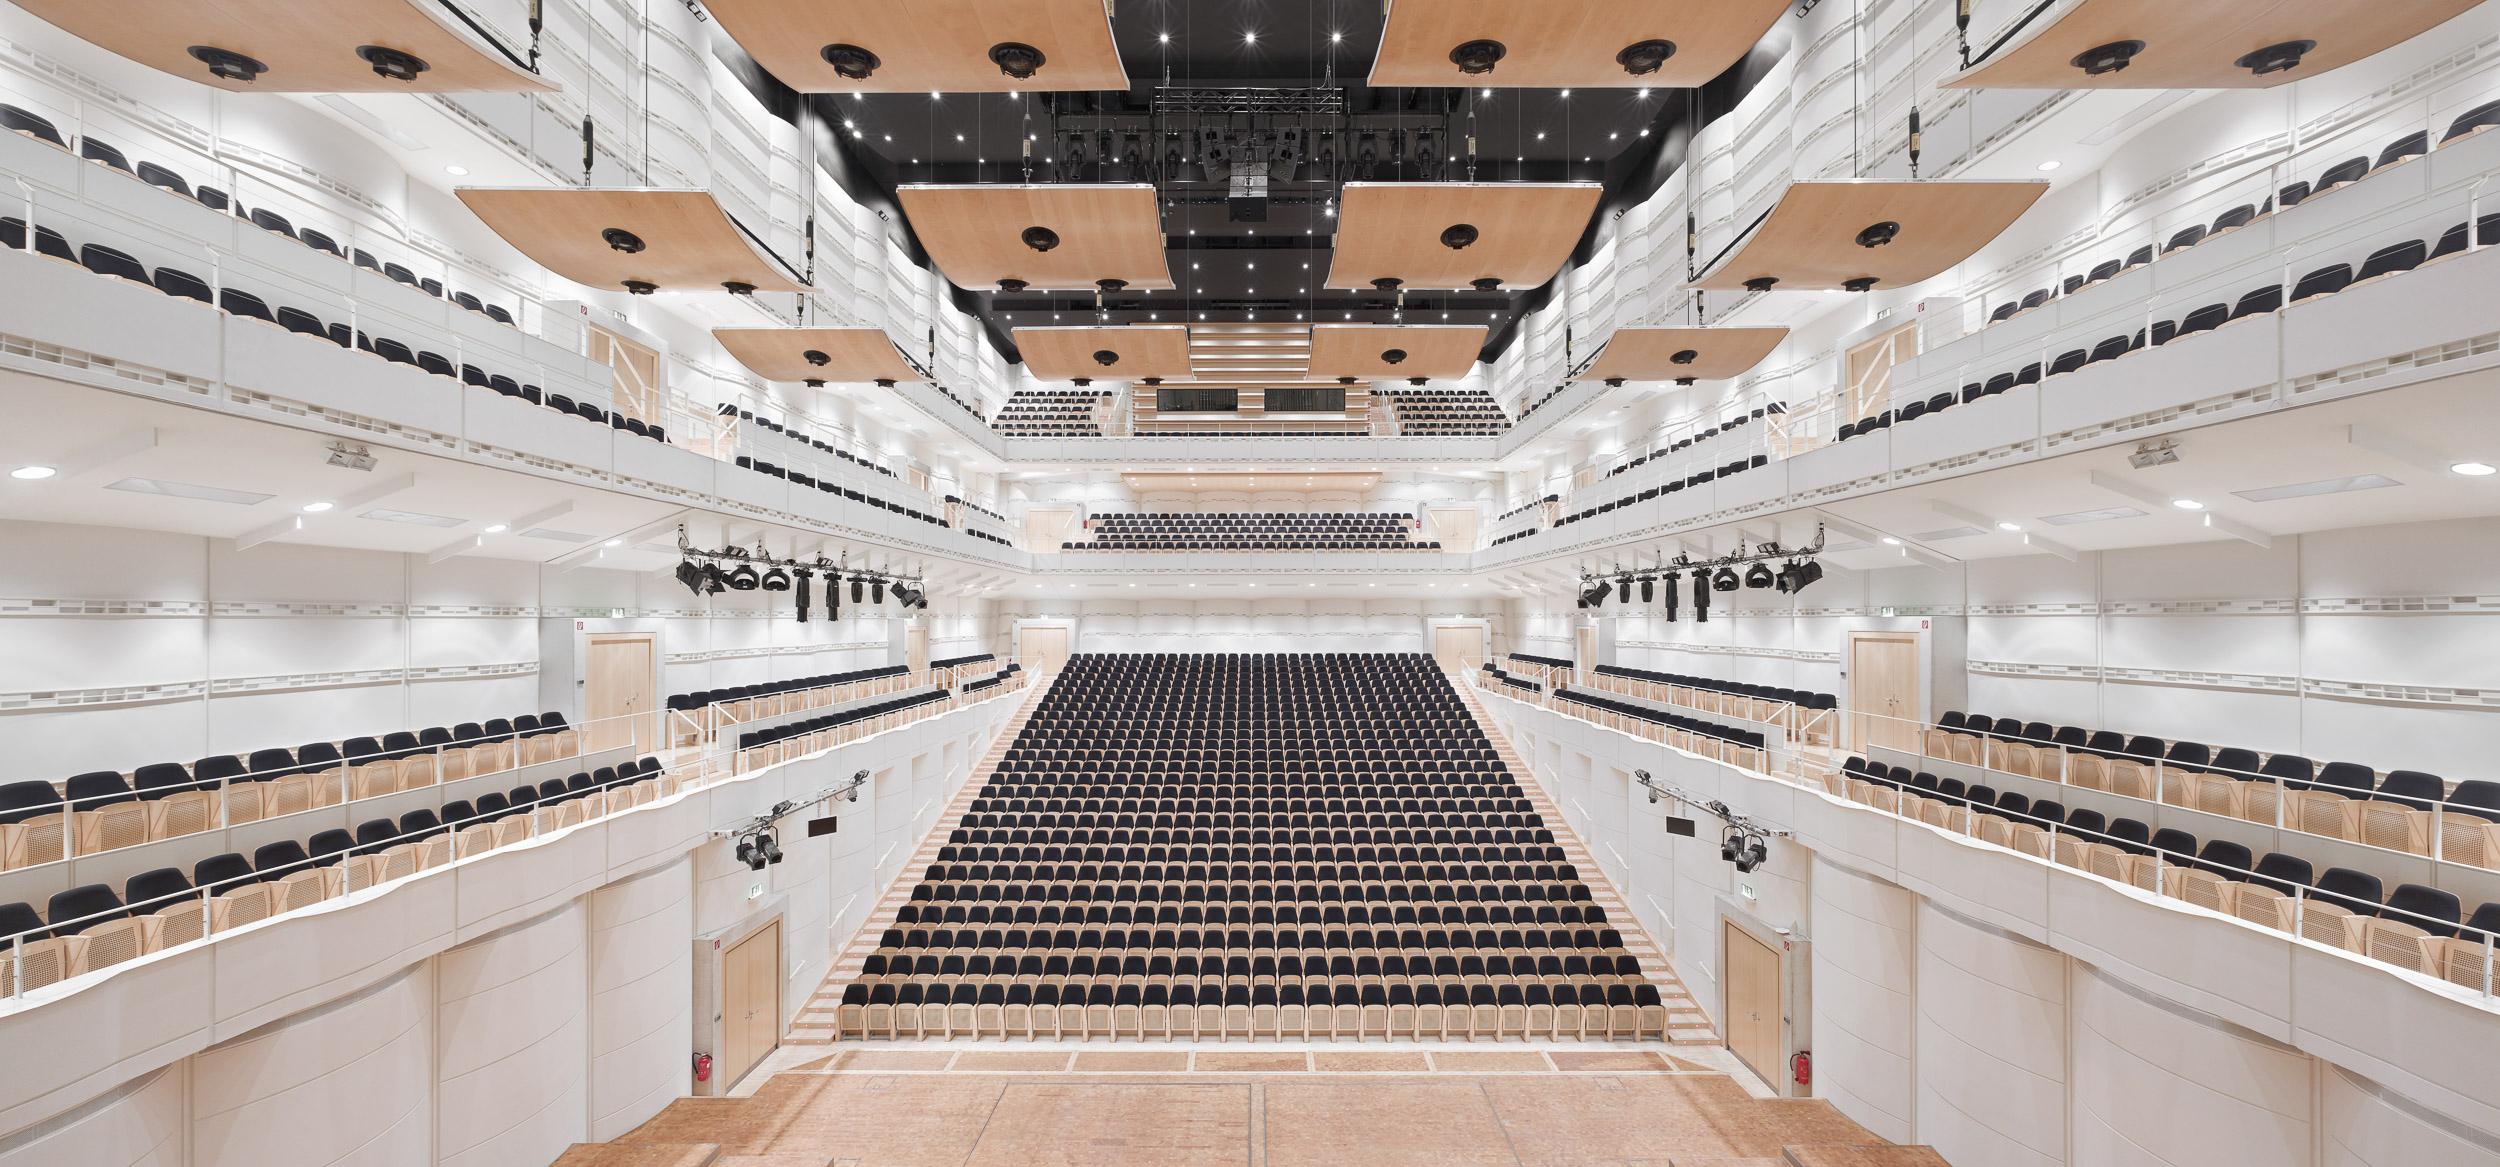 009-Konzerthaus-DO_002.jpg